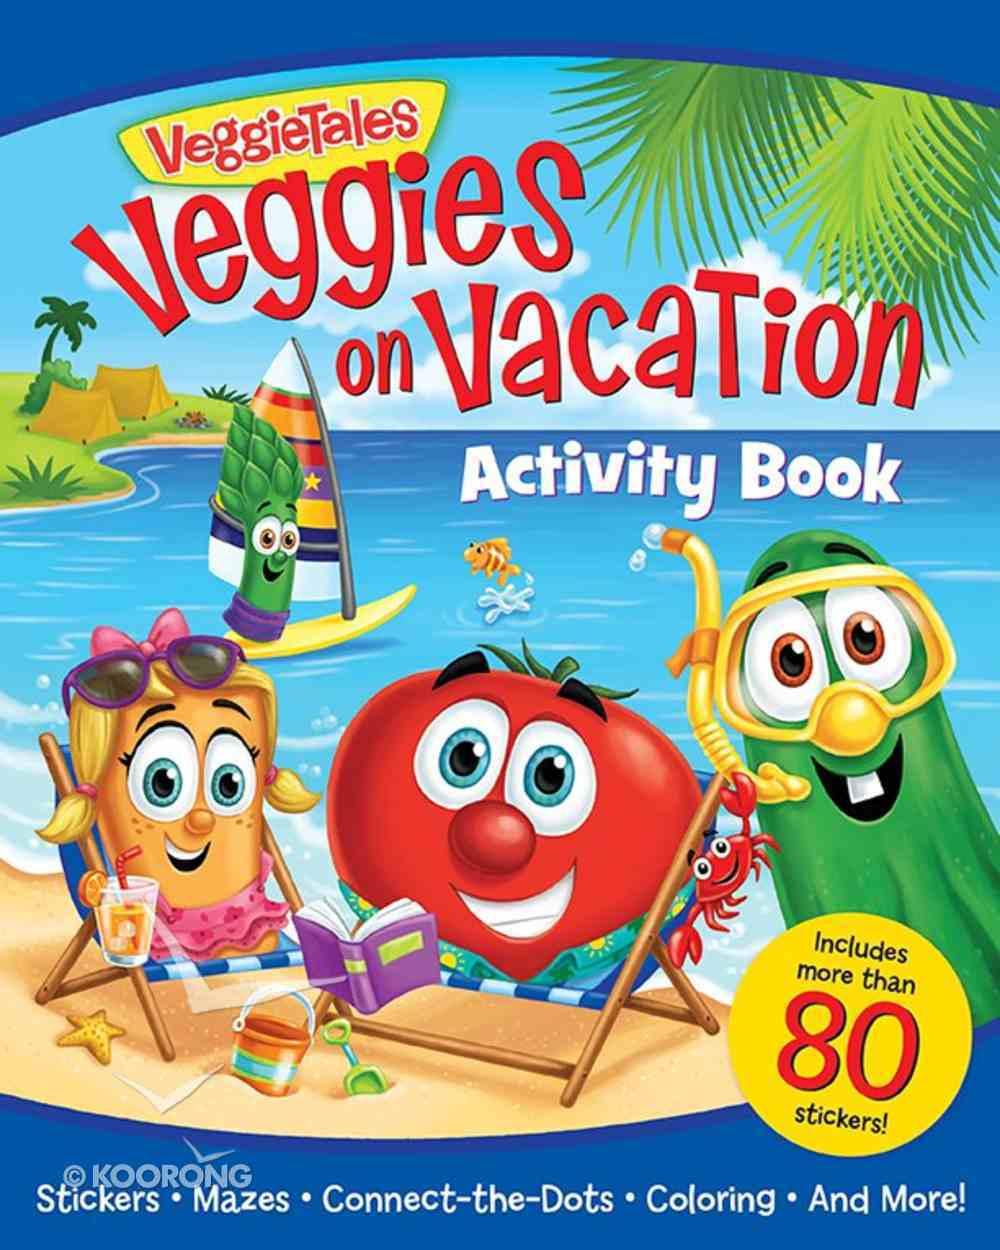 Veggies on Vacation Activity Book (Veggie Tales (Veggietales) Series) Paperback